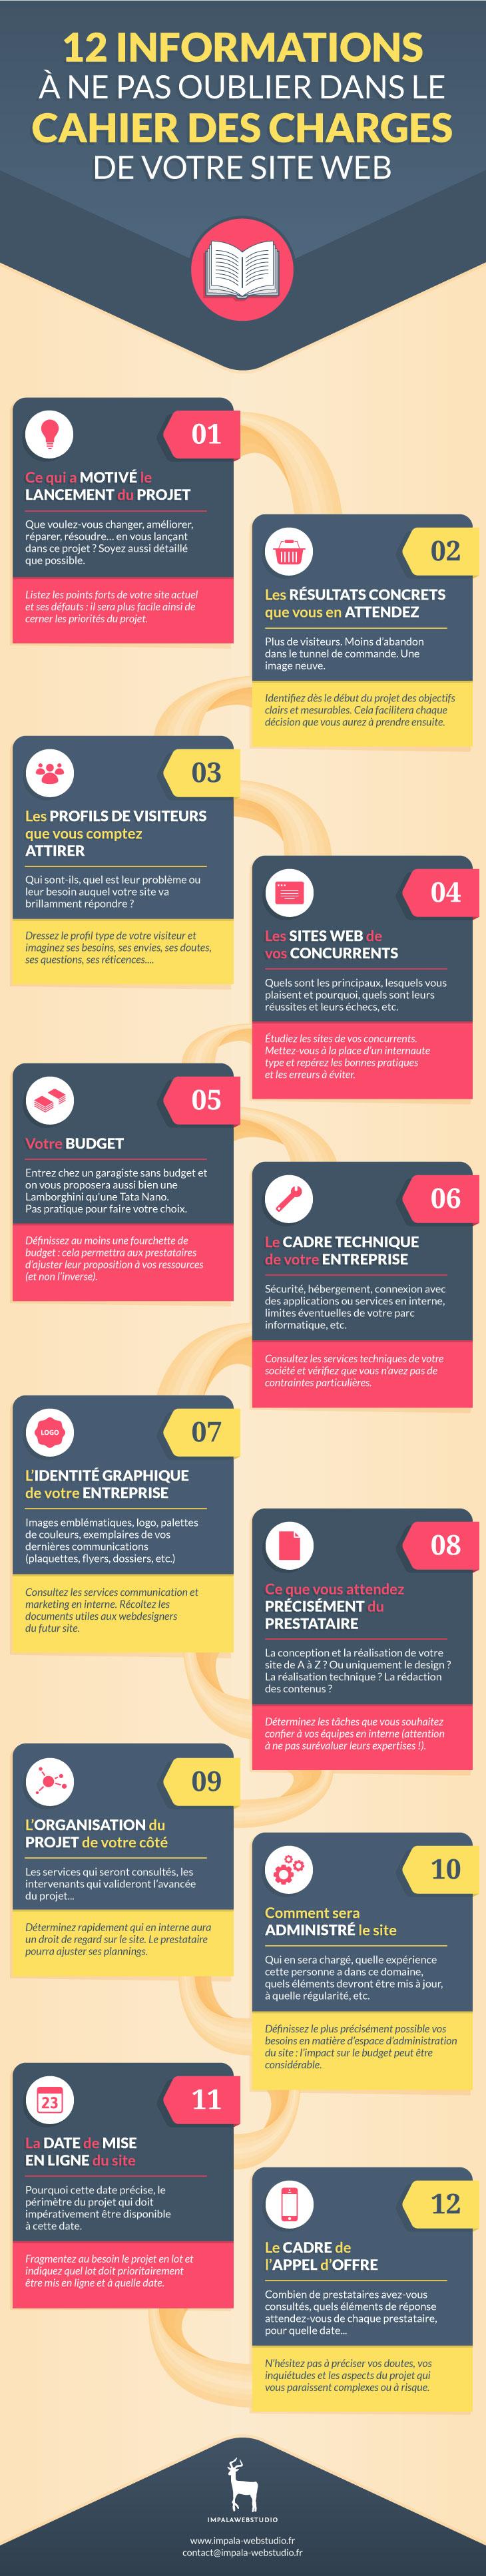 Cahier_des_charges_site_internet_12_infos